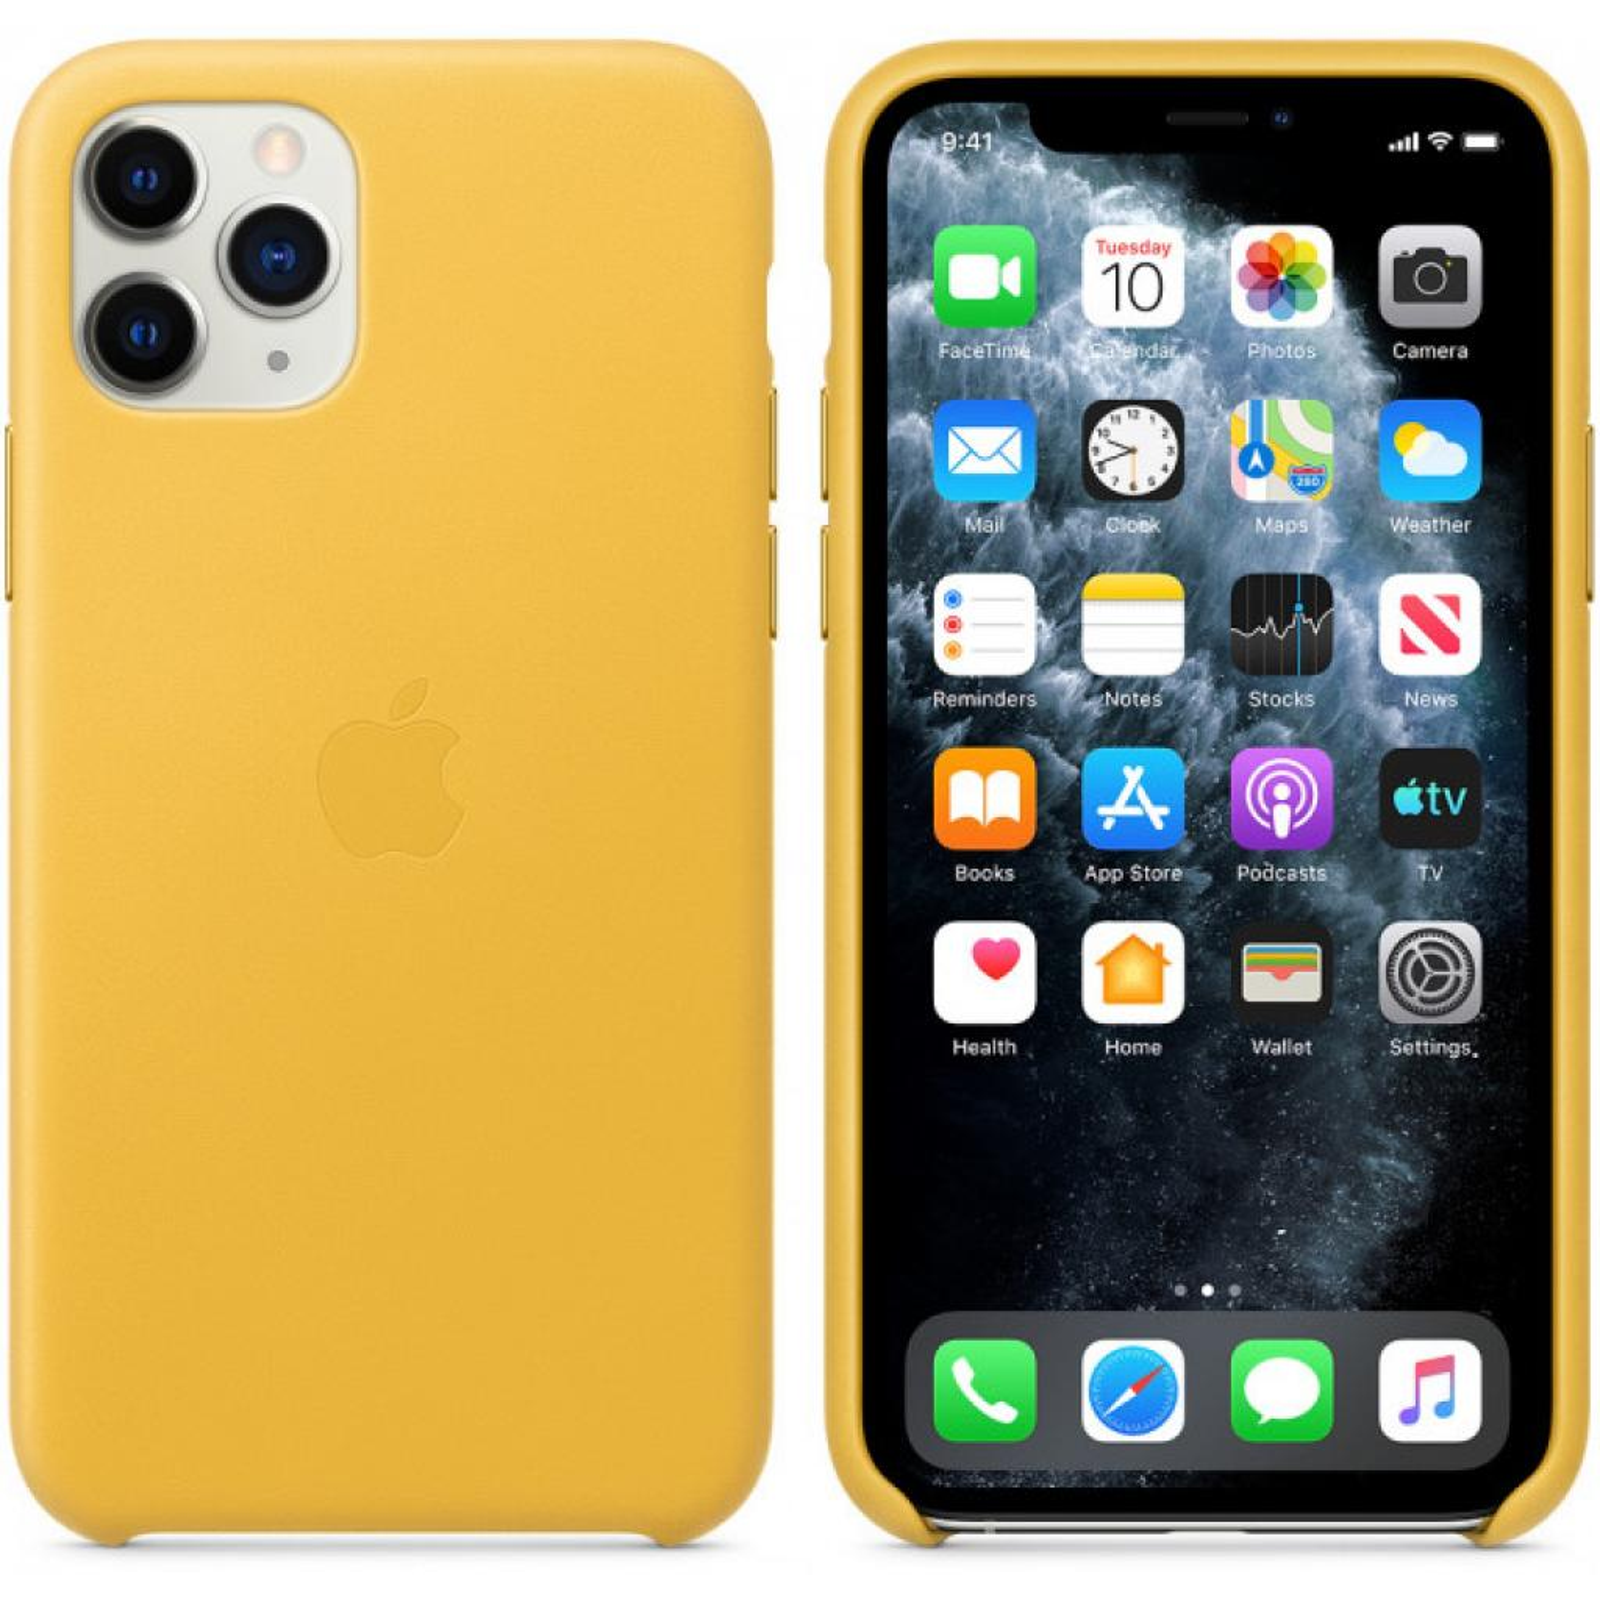 Чехол для моб. телефона Apple iPhone 11 Pro Leather Case - Midnight Blue (MWYG2ZM/A) изображение 5